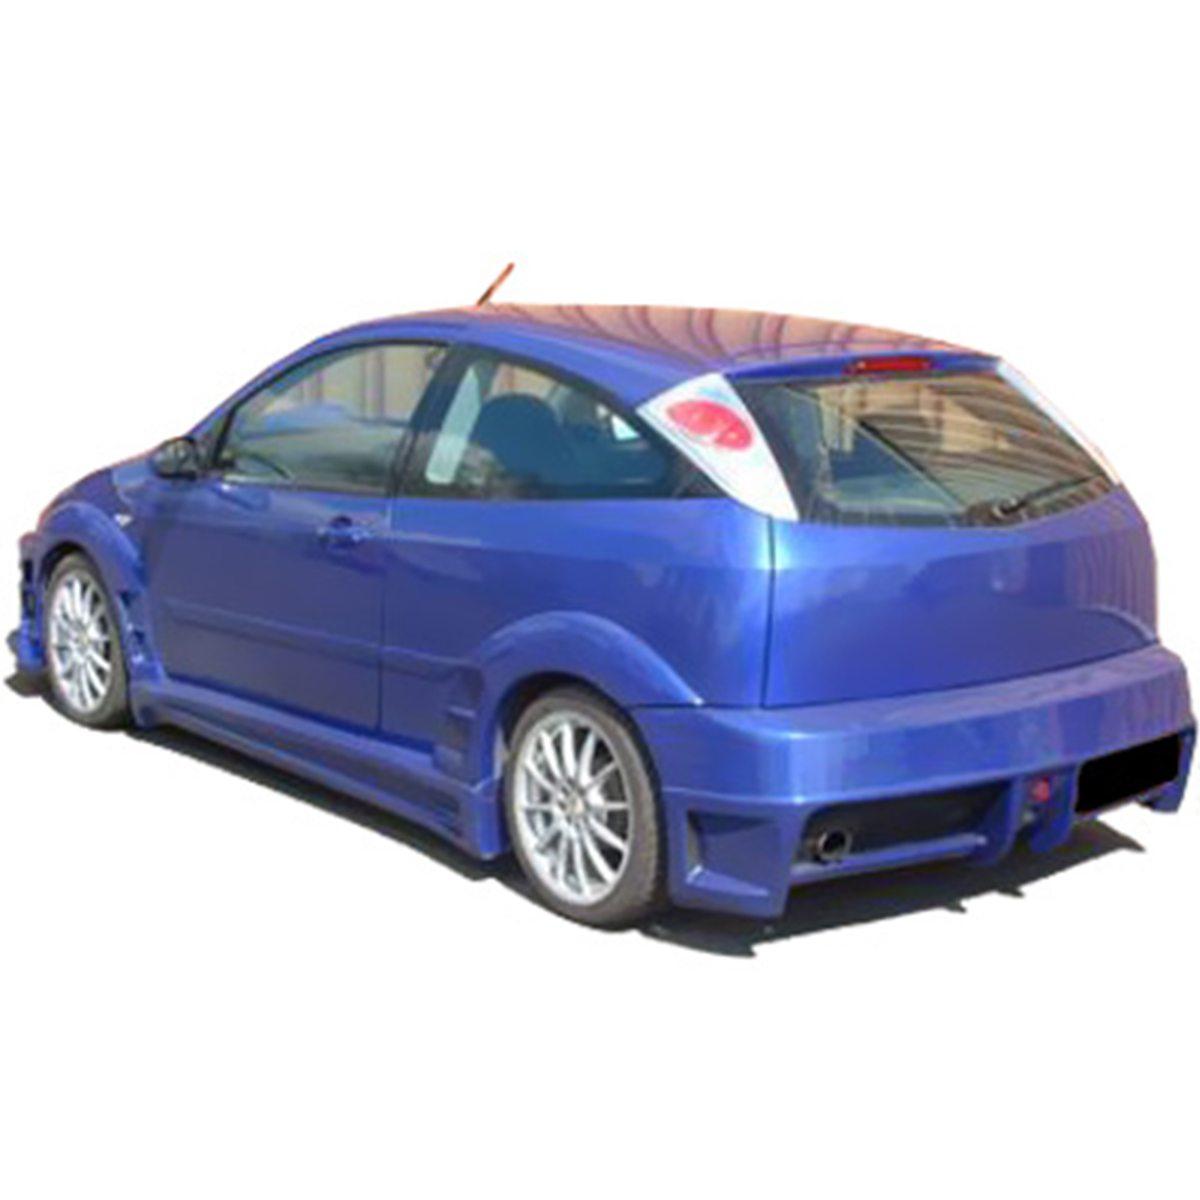 Ford-Focus-BadBoy-Wide-tras-PCA037